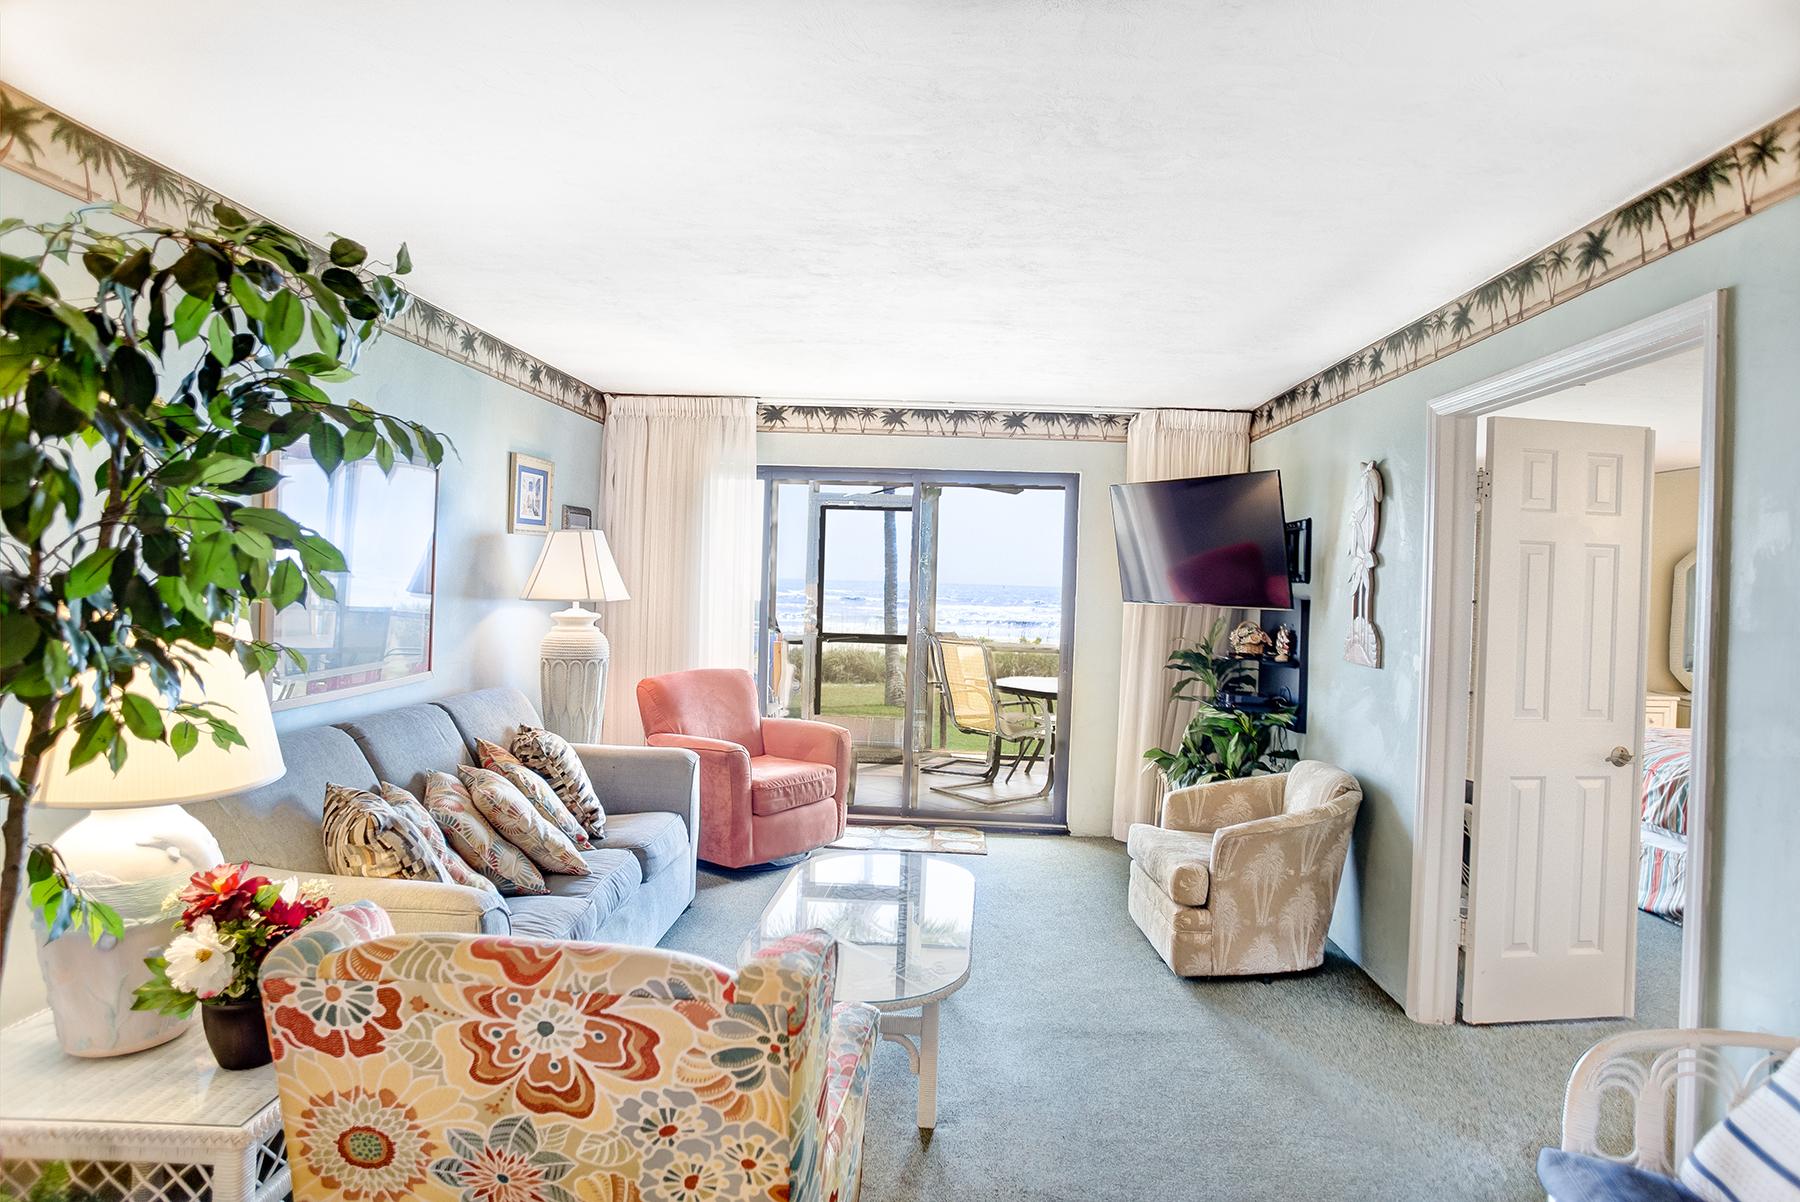 Condominium for Sale at SANIBEL 2445 W Gulf Dr E6, Sanibel, Florida 33957 United States